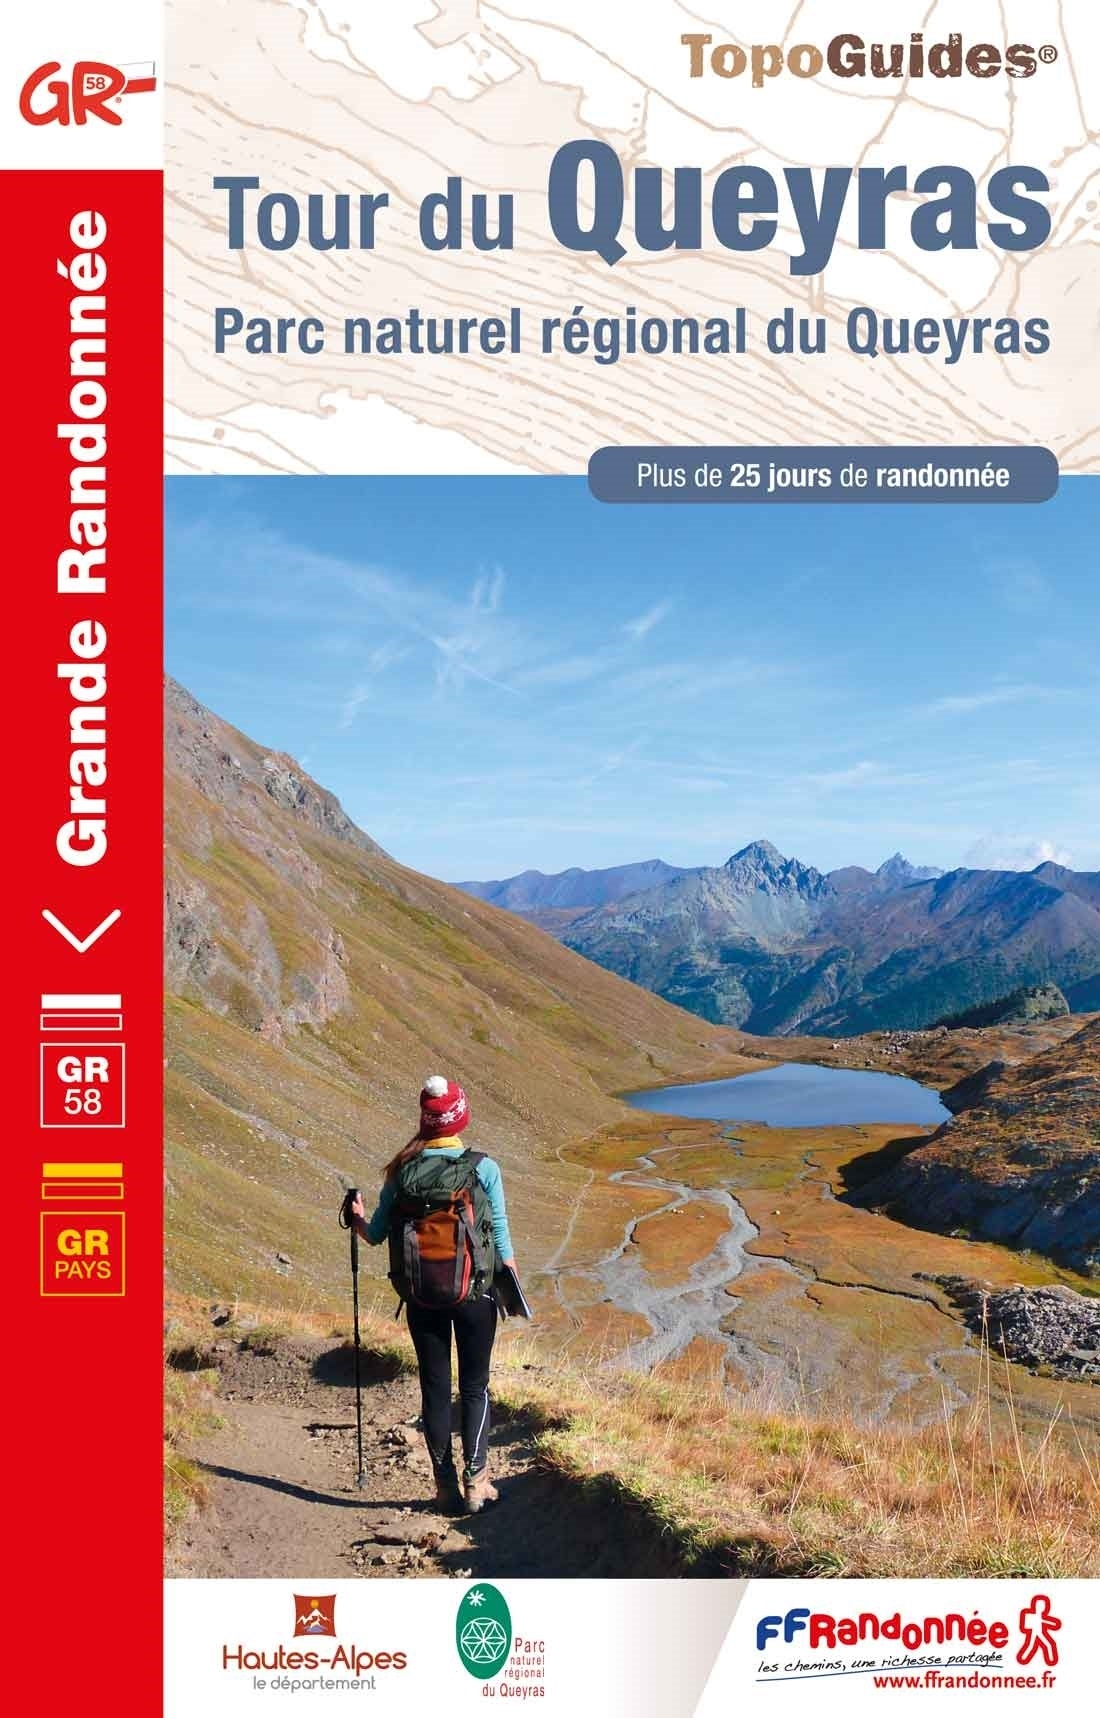 TG505  Tour du Queyras | wandelgids GR-58 9782751403132  FFRP Topoguides  Meerdaagse wandelroutes, Wandelgidsen Franse Alpen: zuid